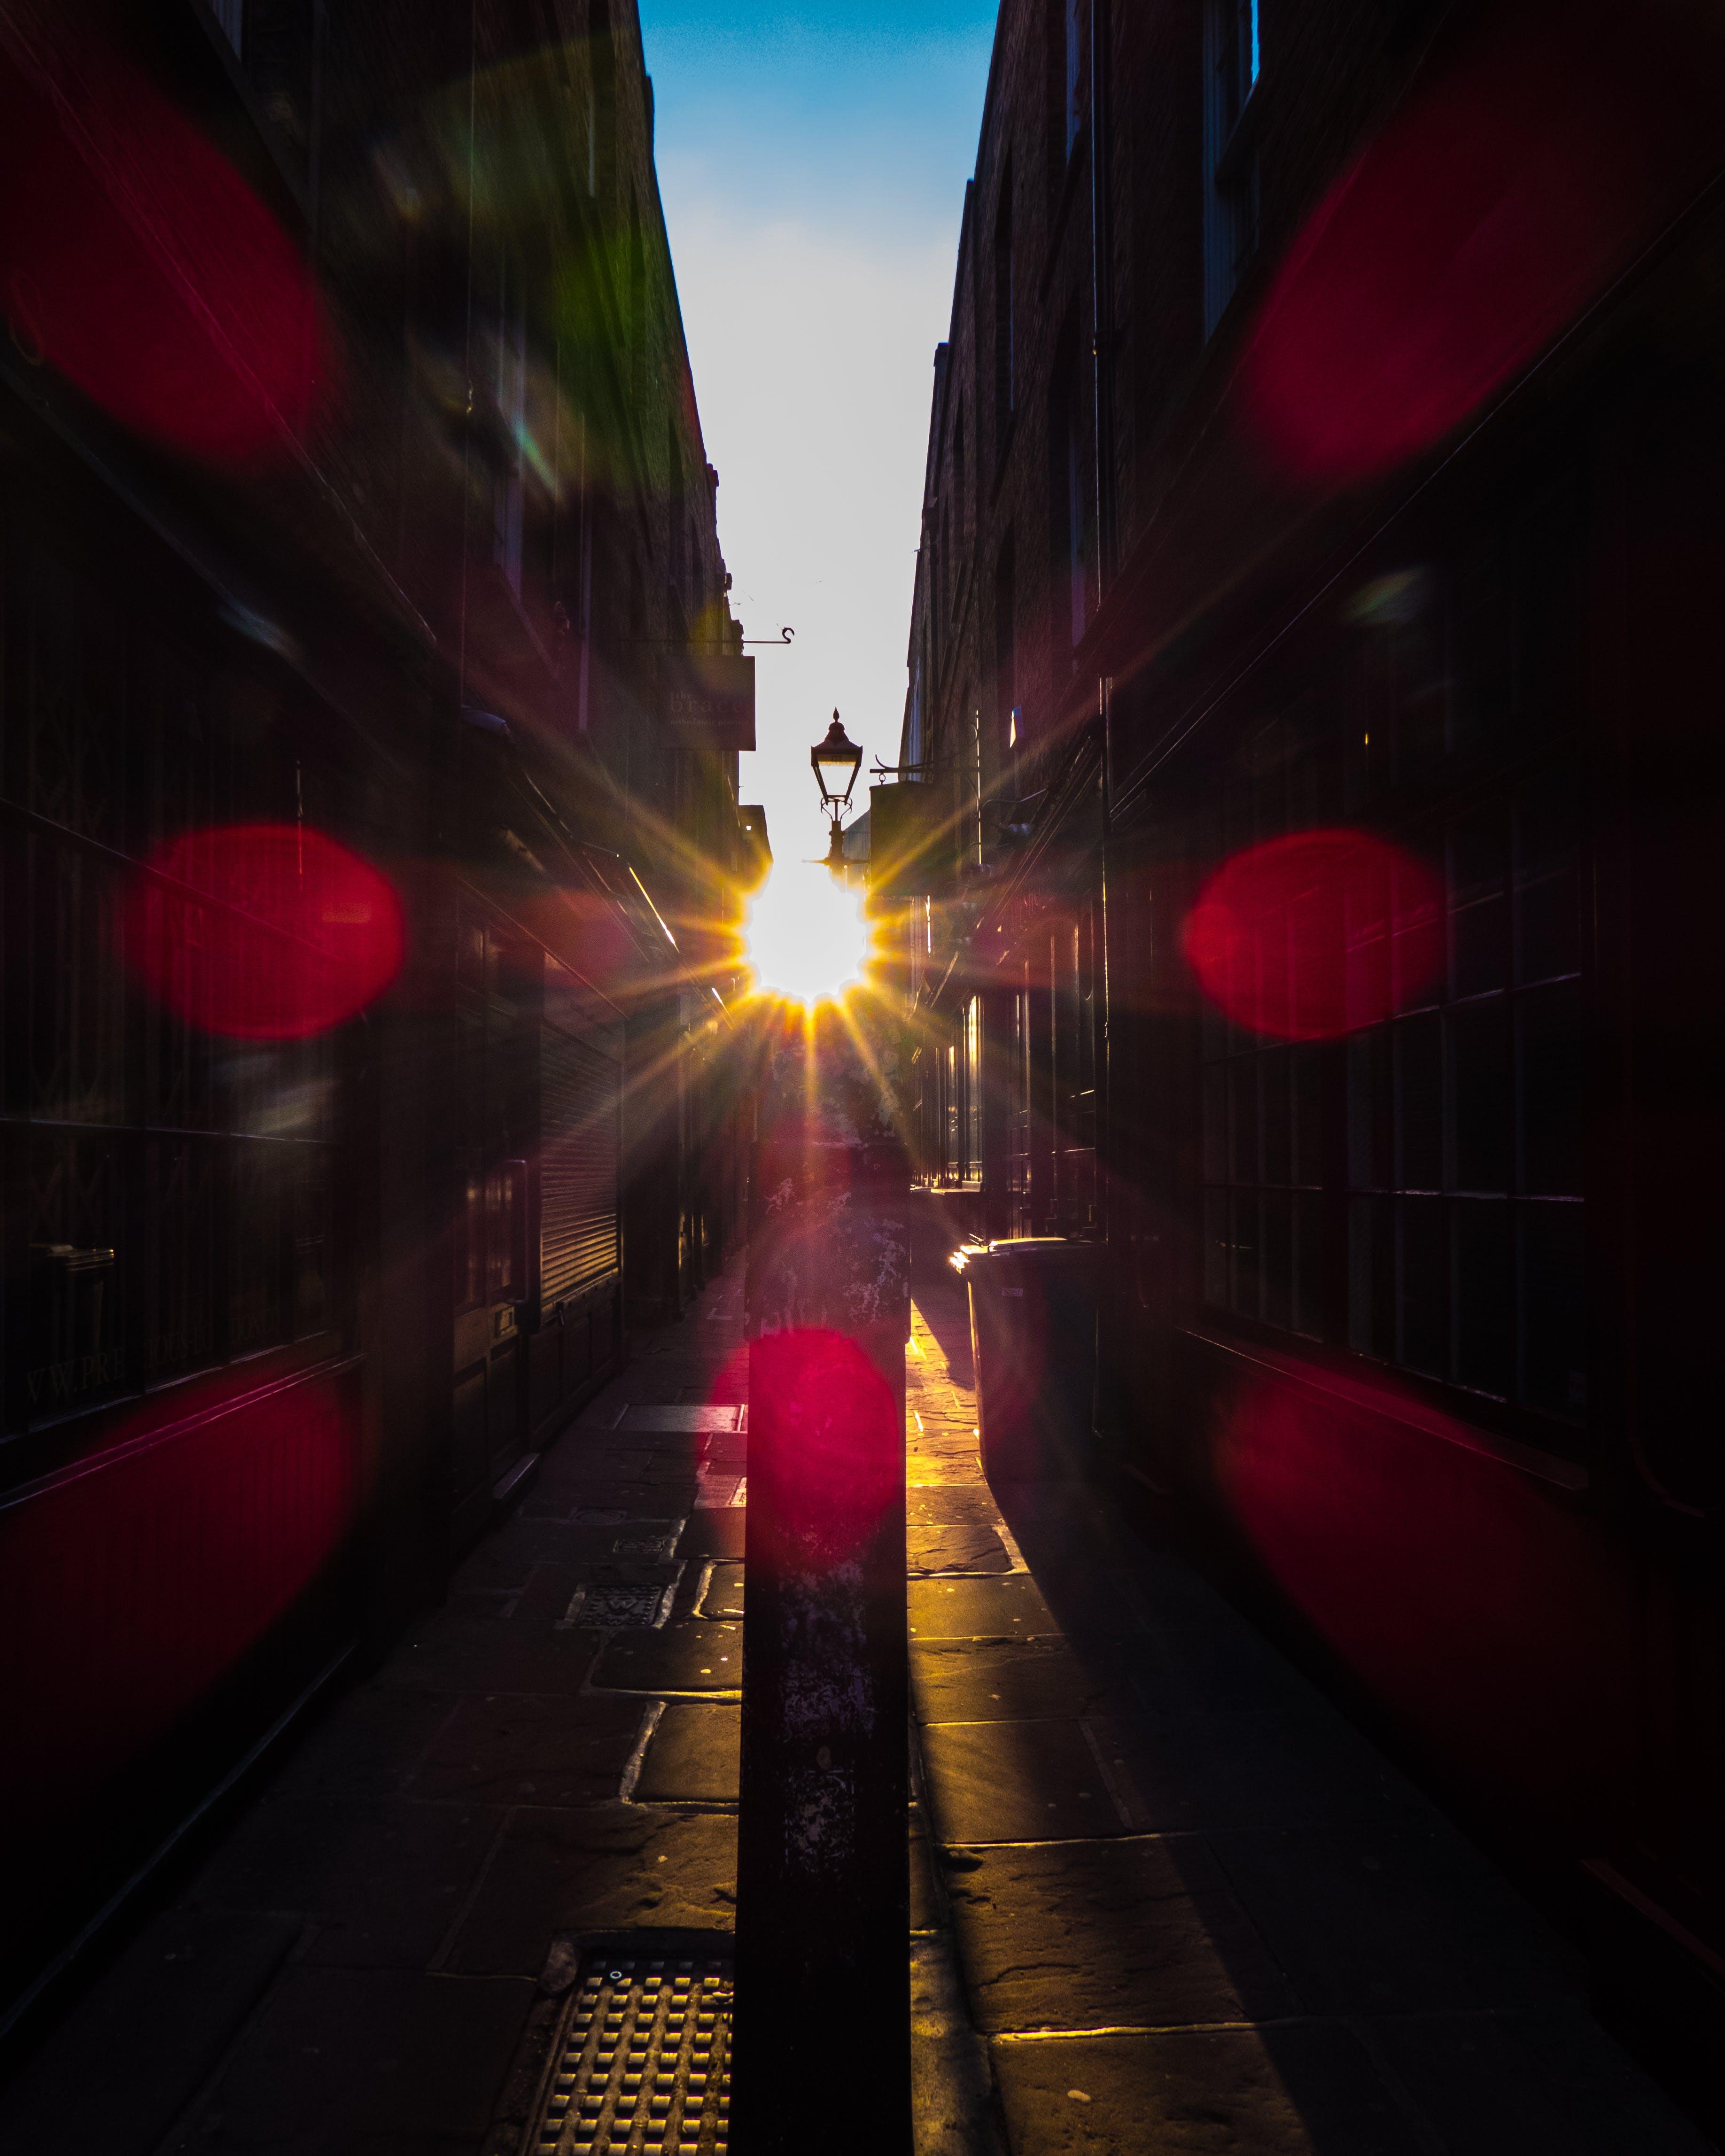 Gratis arkivbilde med london, londres, lysskjær, oxford gate